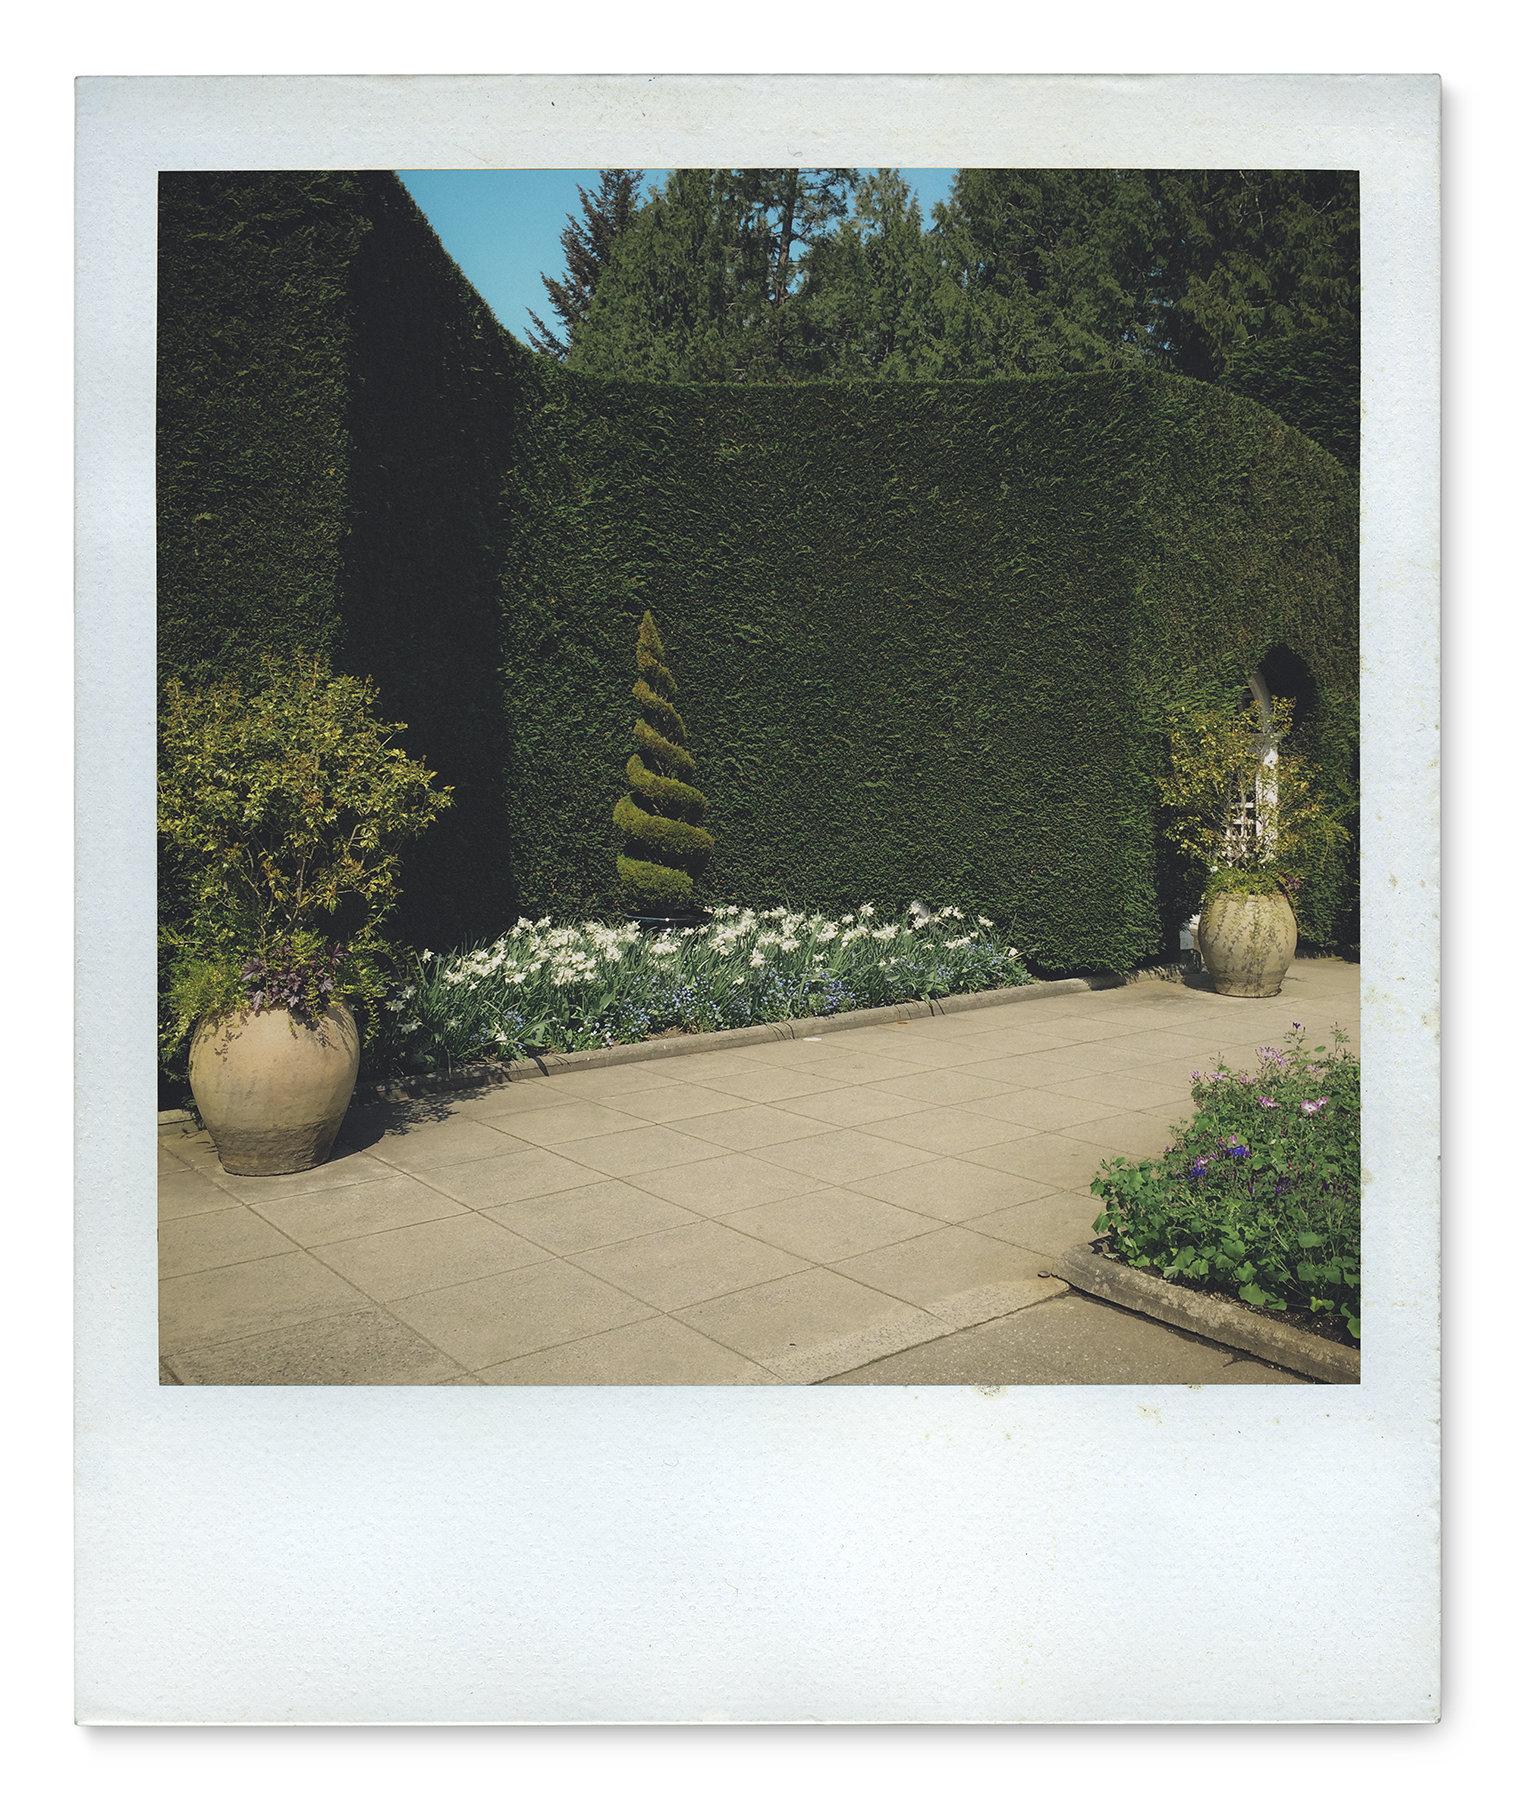 058_Polaroid SX70_IMG_1882.jpg